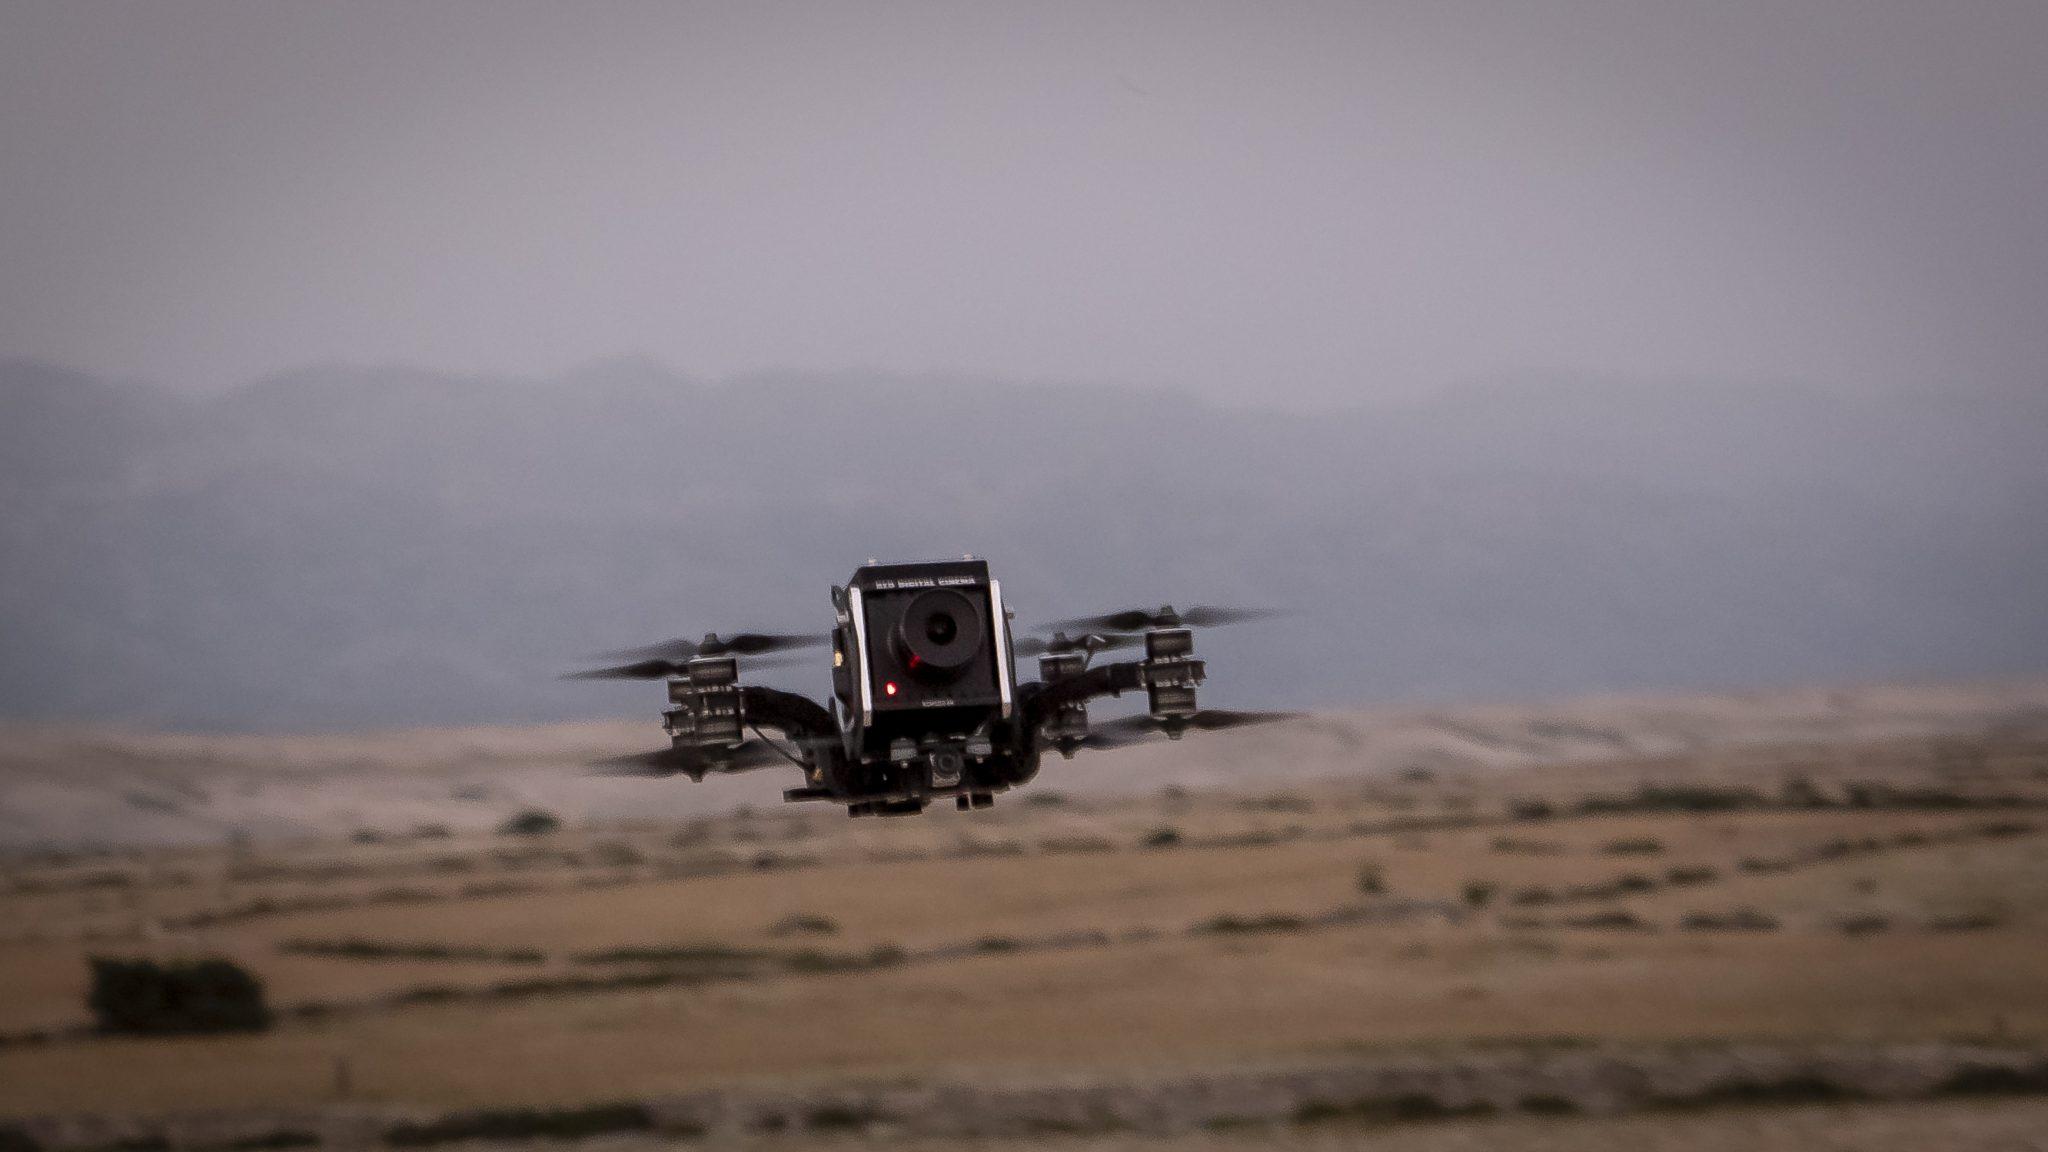 Red Komodo FPV Race Drohne mit Pilot Berlin